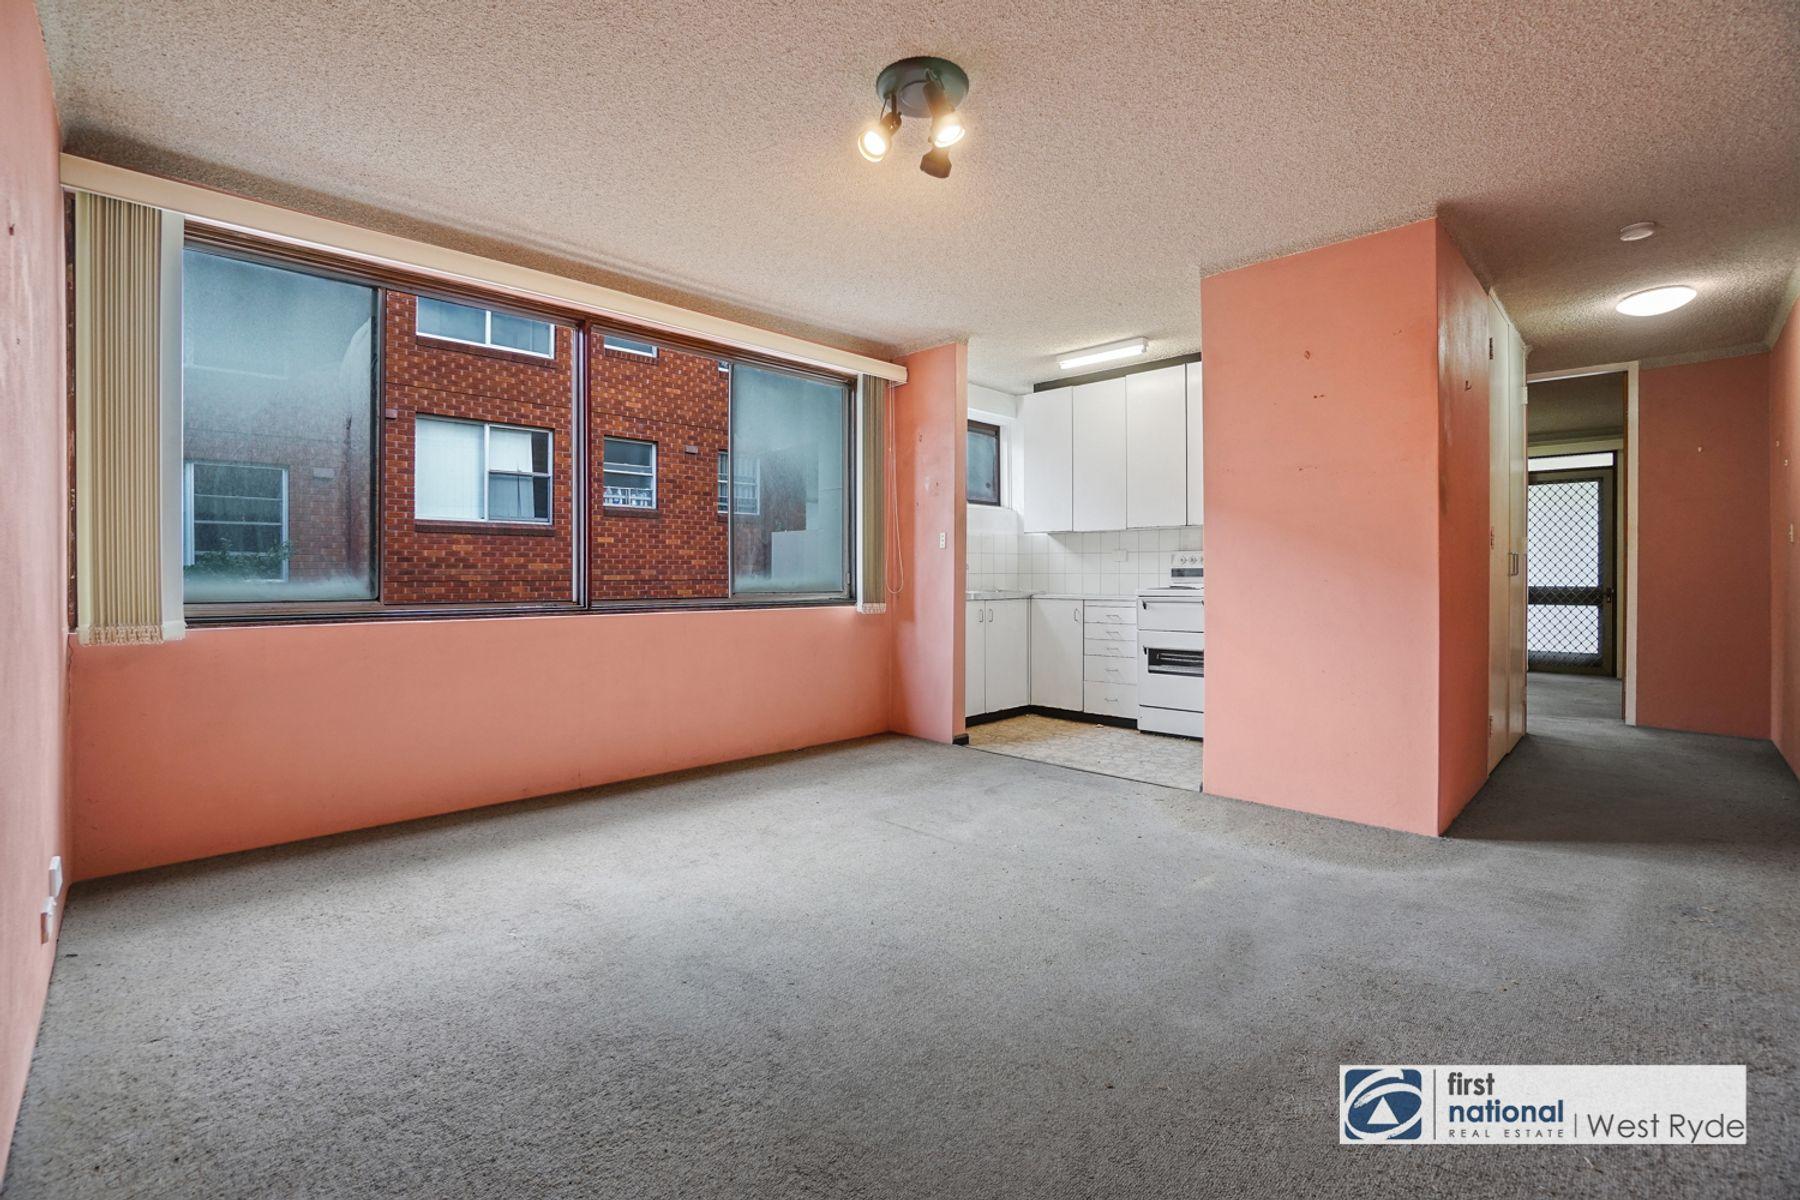 5/52 Meadow Crescent, Meadowbank, NSW 2114